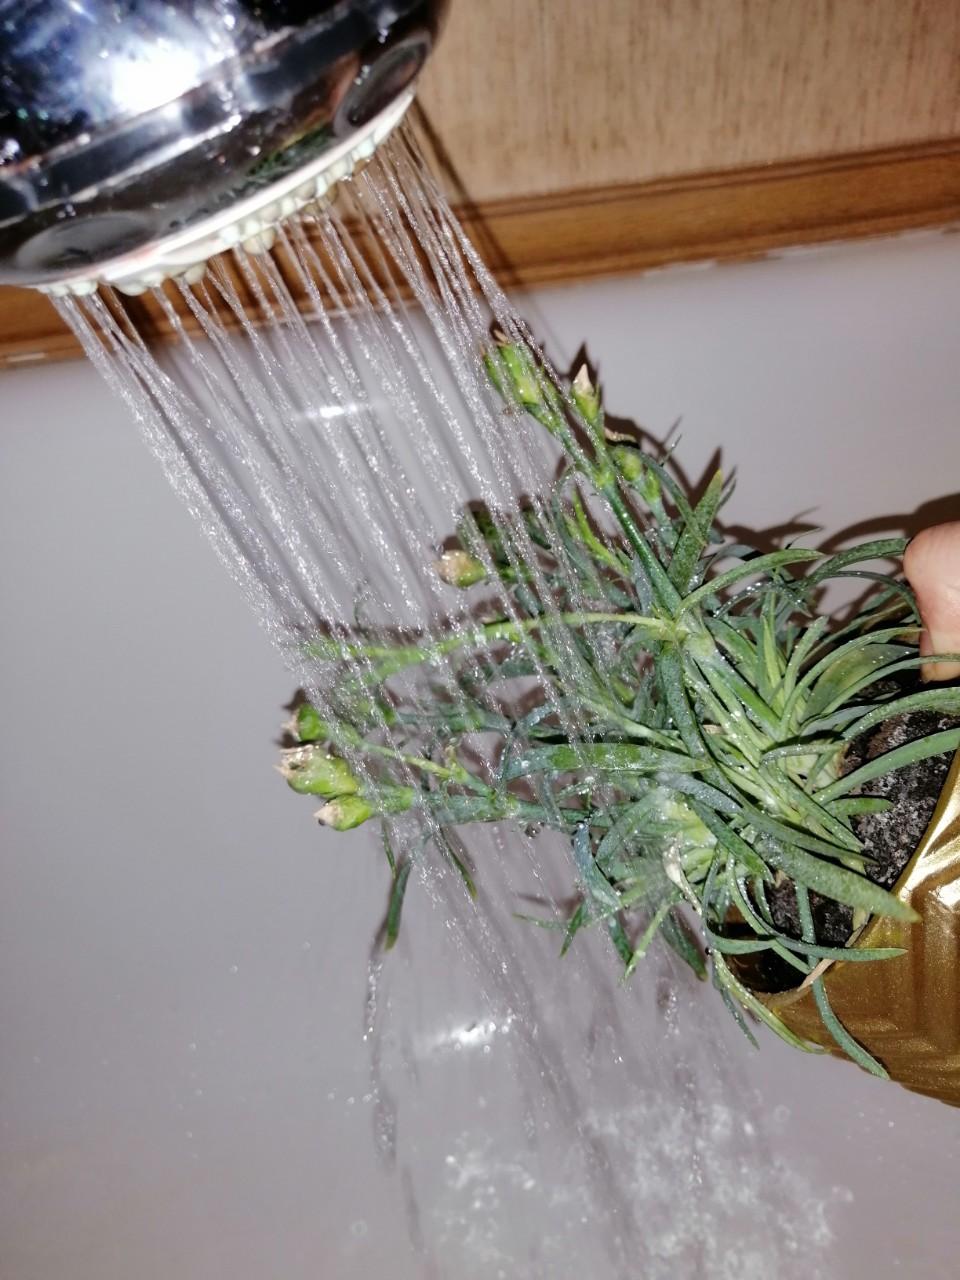 паутинный клещ теплый душ